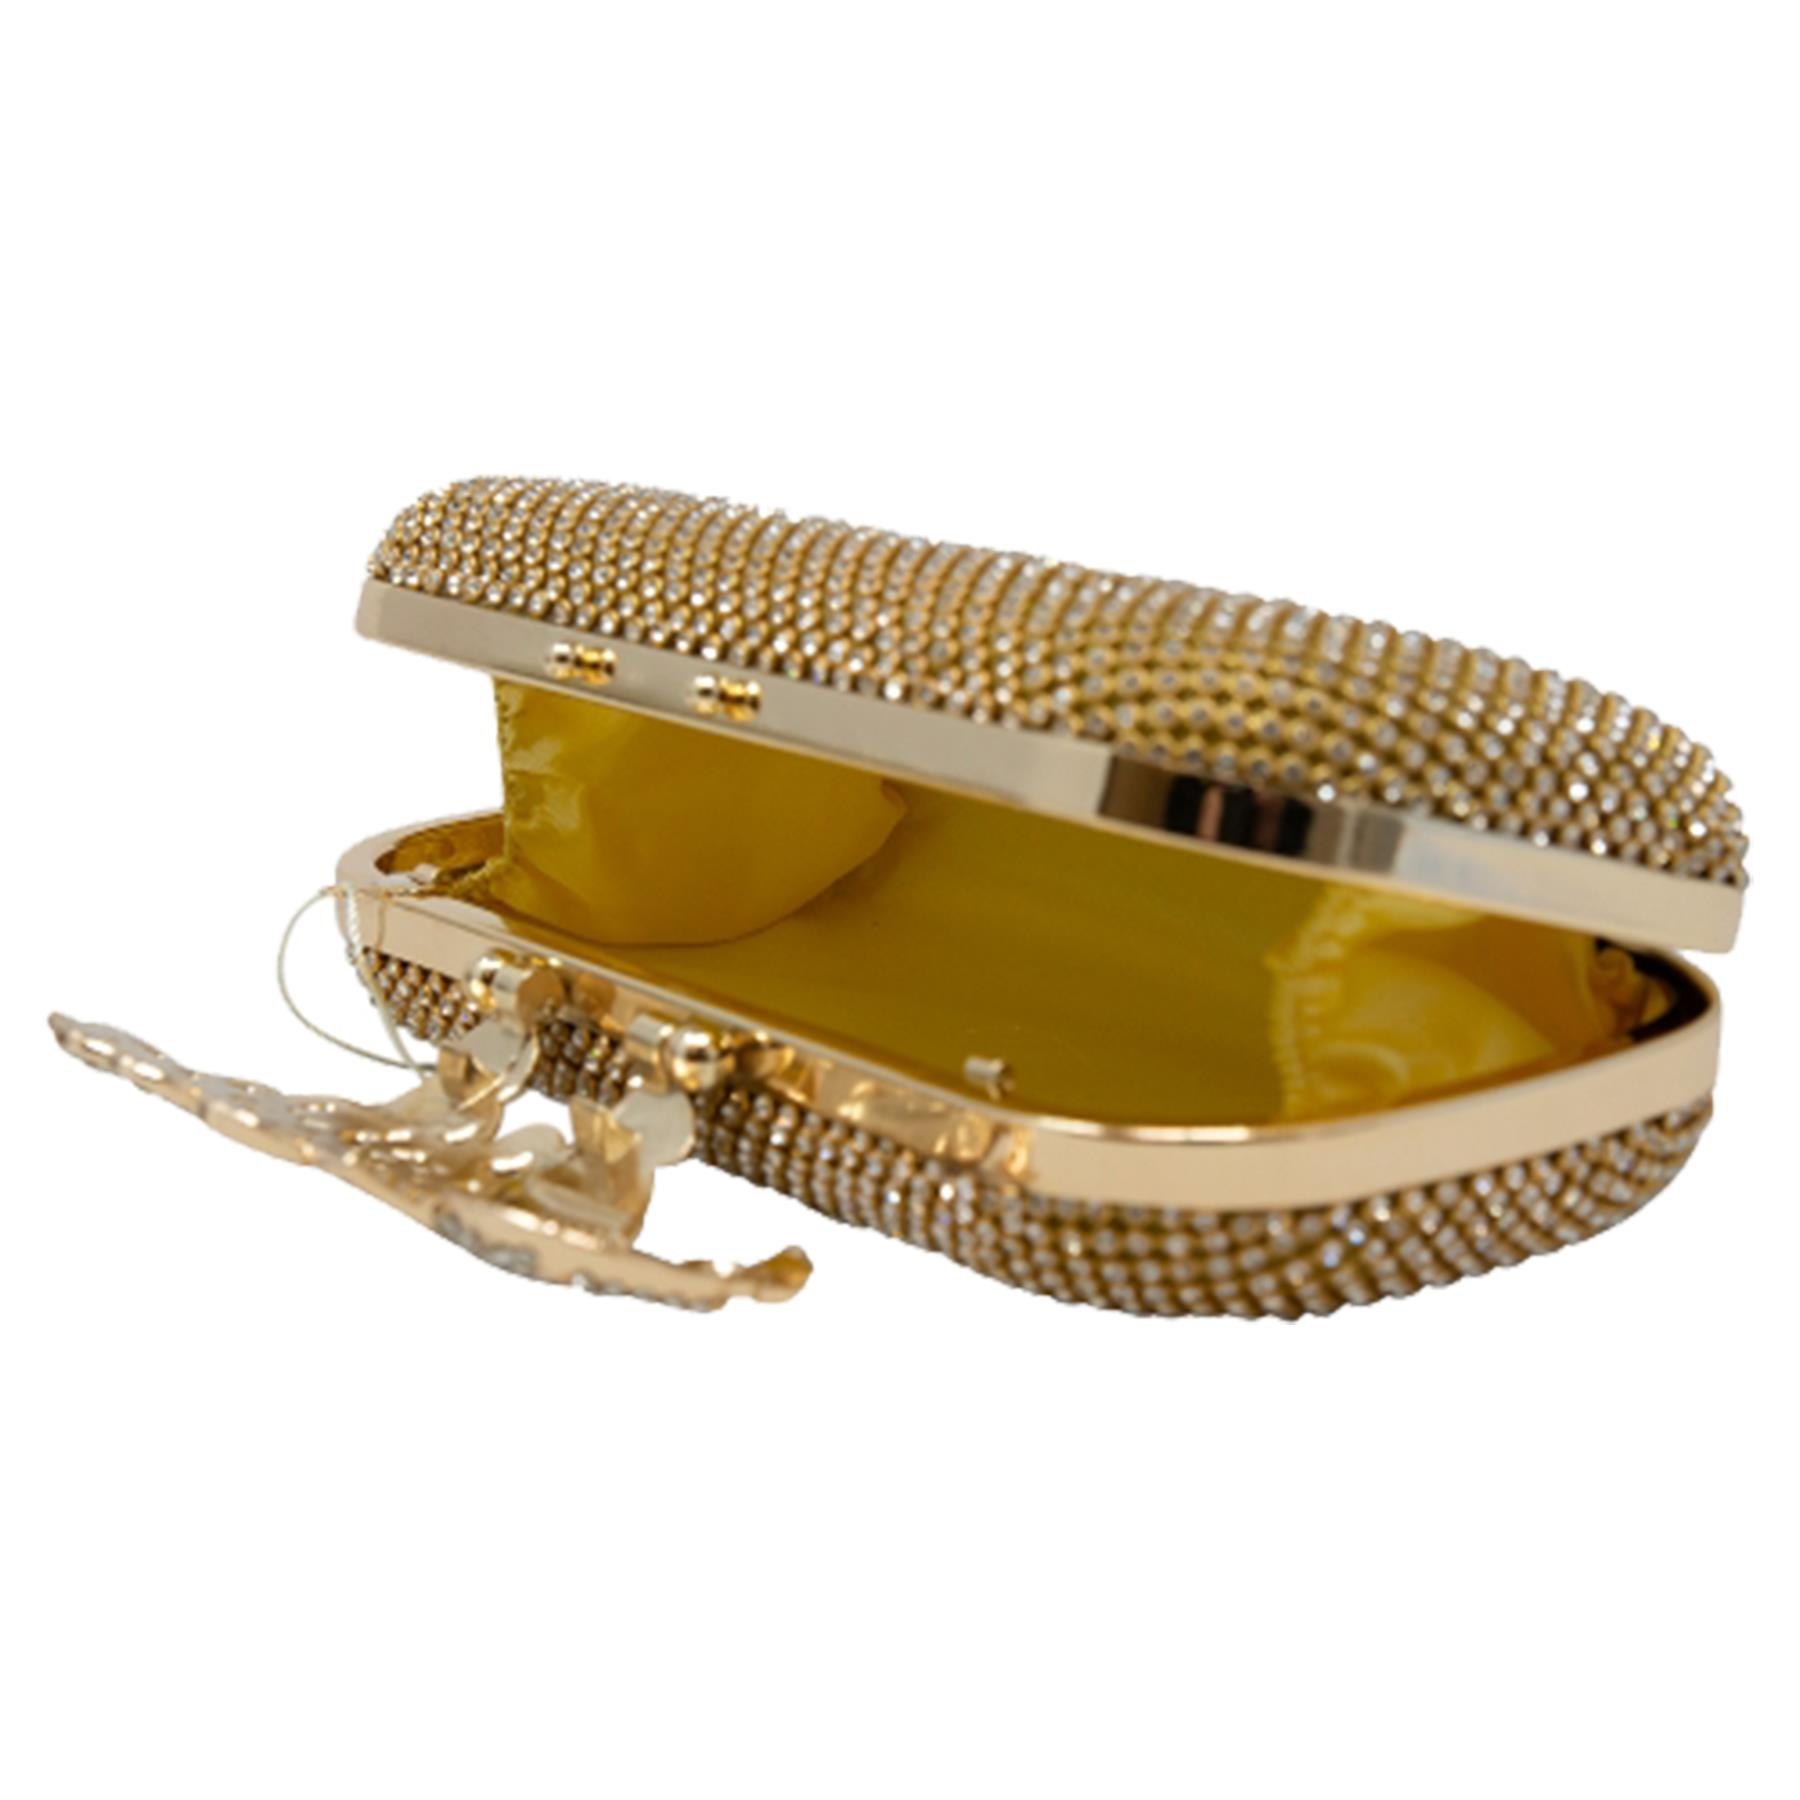 New-Women-s-Jewel-Elephant-Detail-Diamante-Chain-Box-Clutch-Bag-Purse thumbnail 9